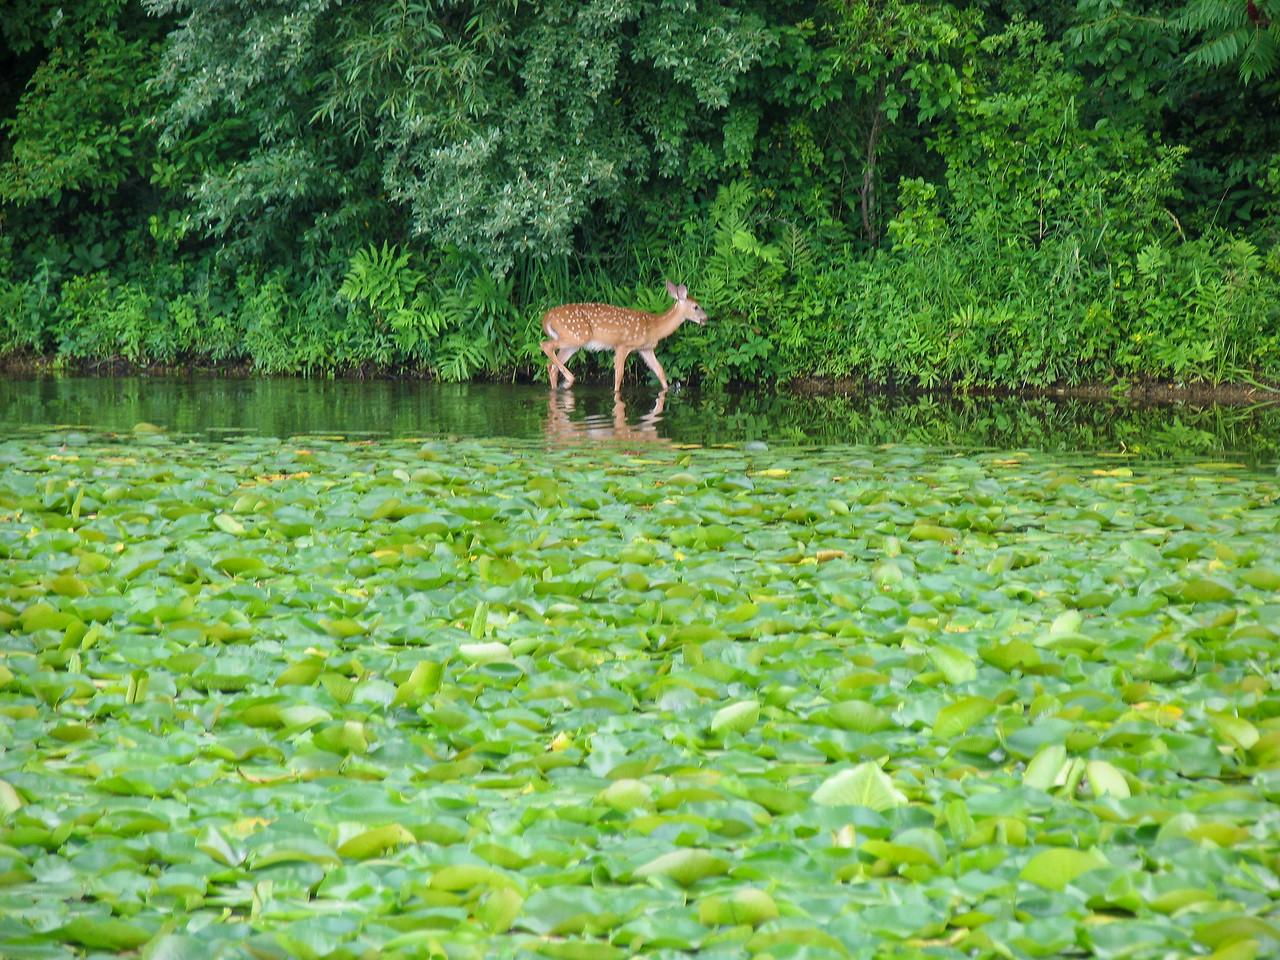 Deer at Lake Nockamixon - July 2005